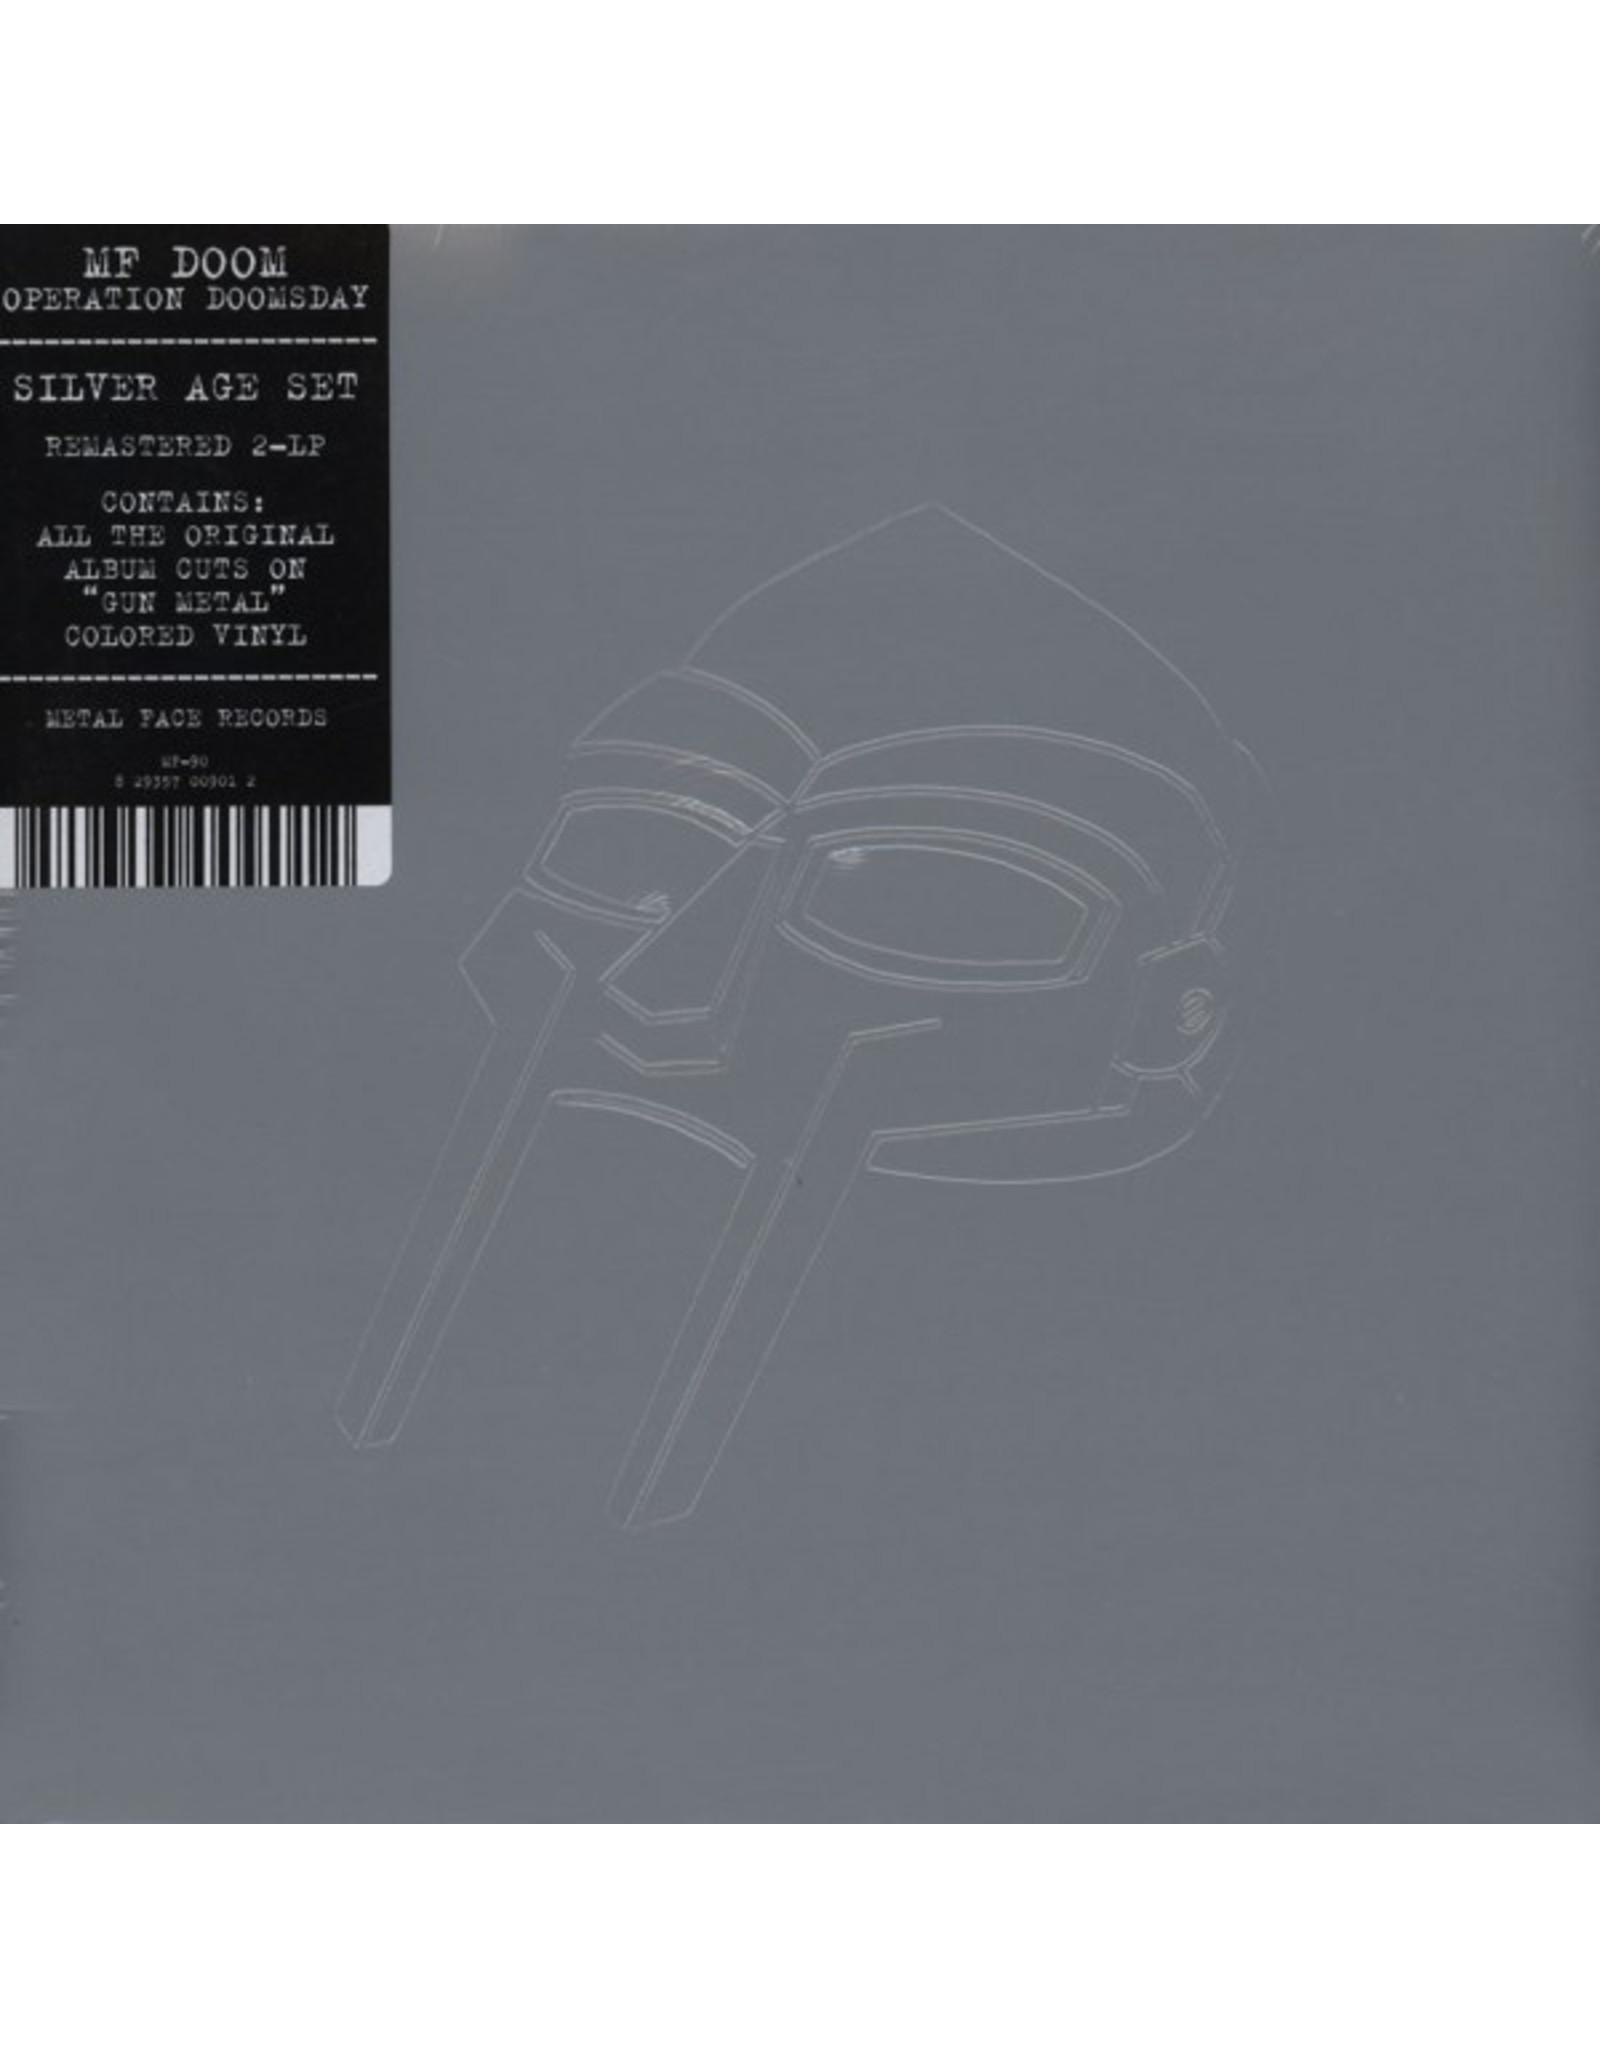 New Vinyl MF DOOM - Operation Doomsday (Silver Cover) 2LP